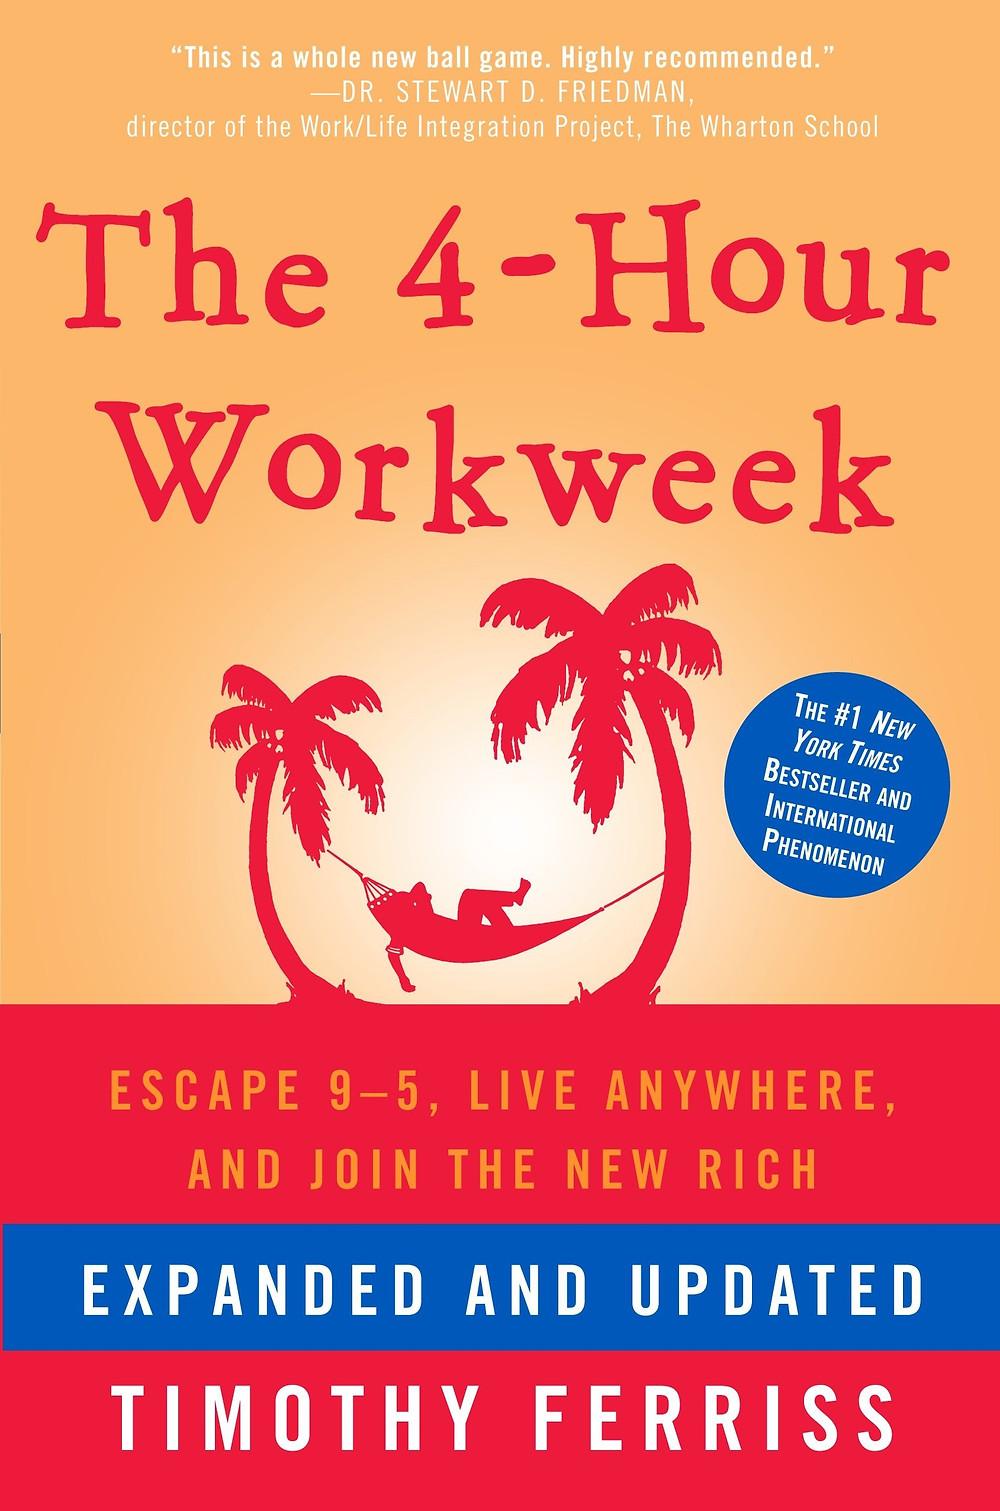 Tim Ferriss 4 -Hour Workweek Review